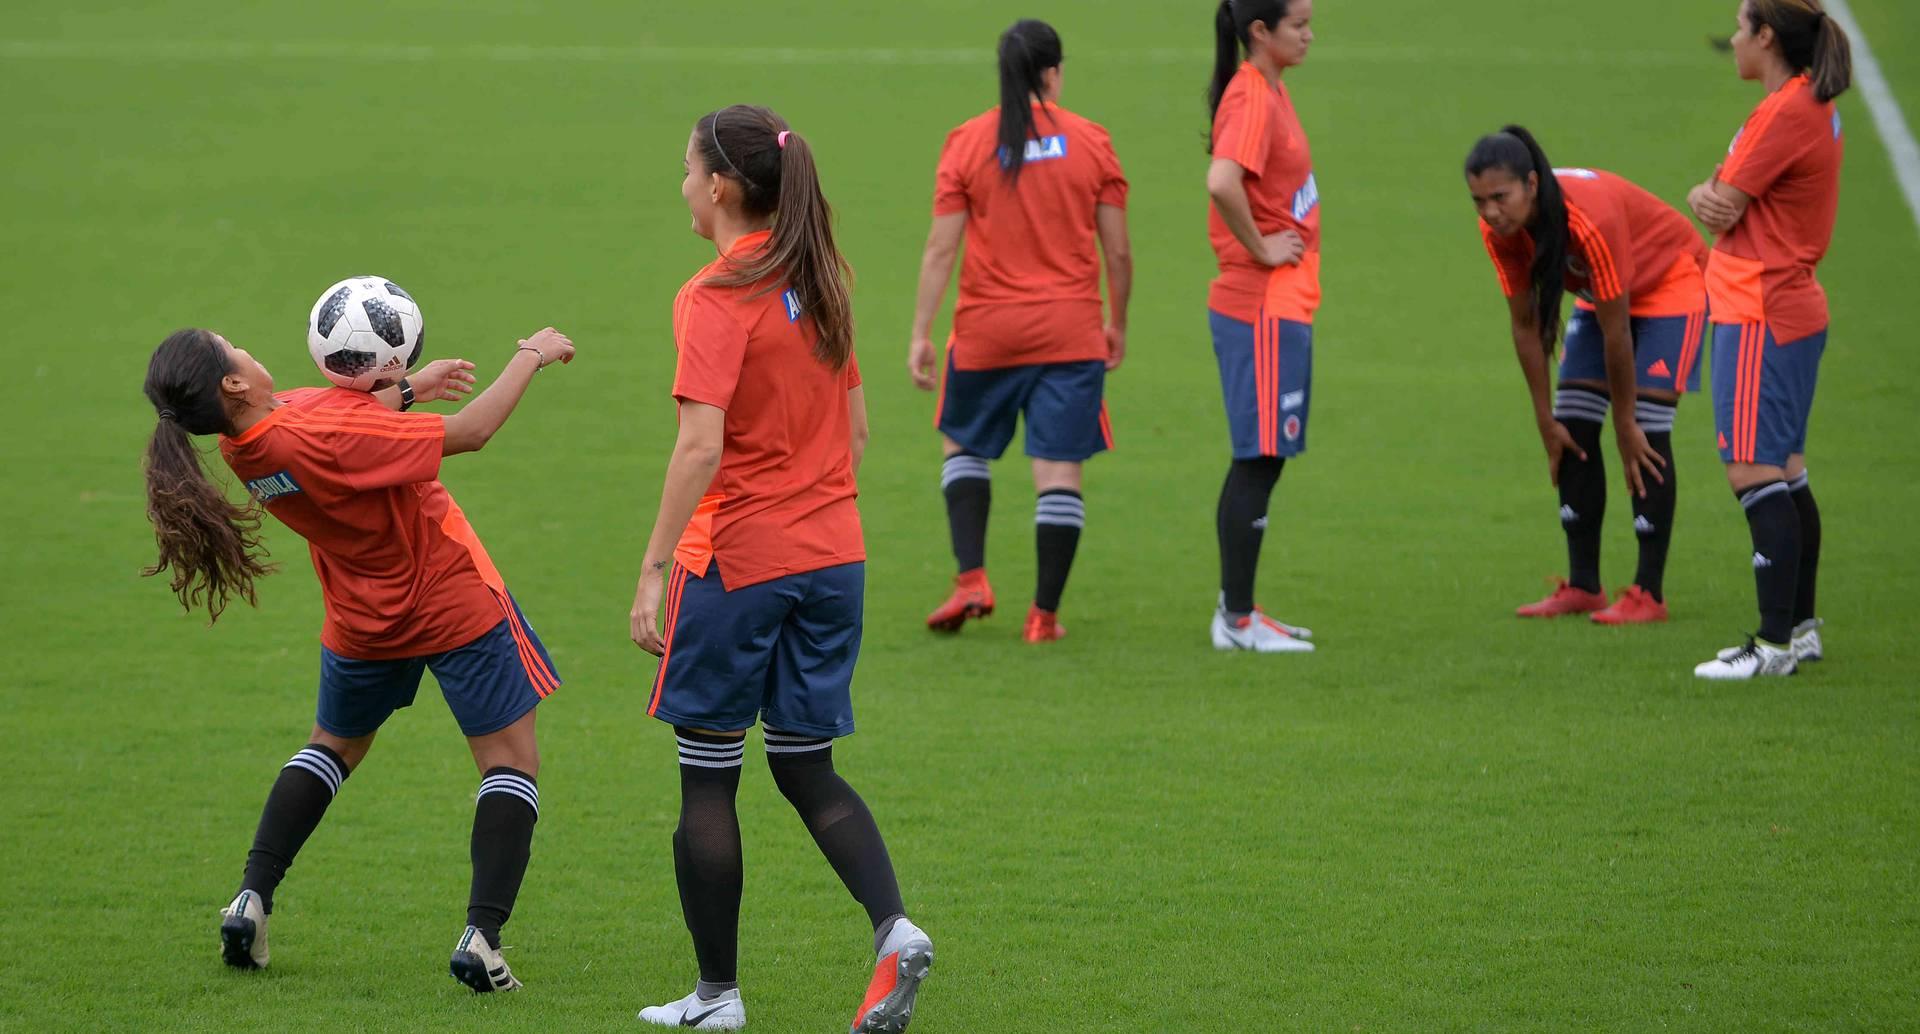 Colombia hoy: Federación de Fútbol acusa de discriminación a Fifa | Mundial femenino